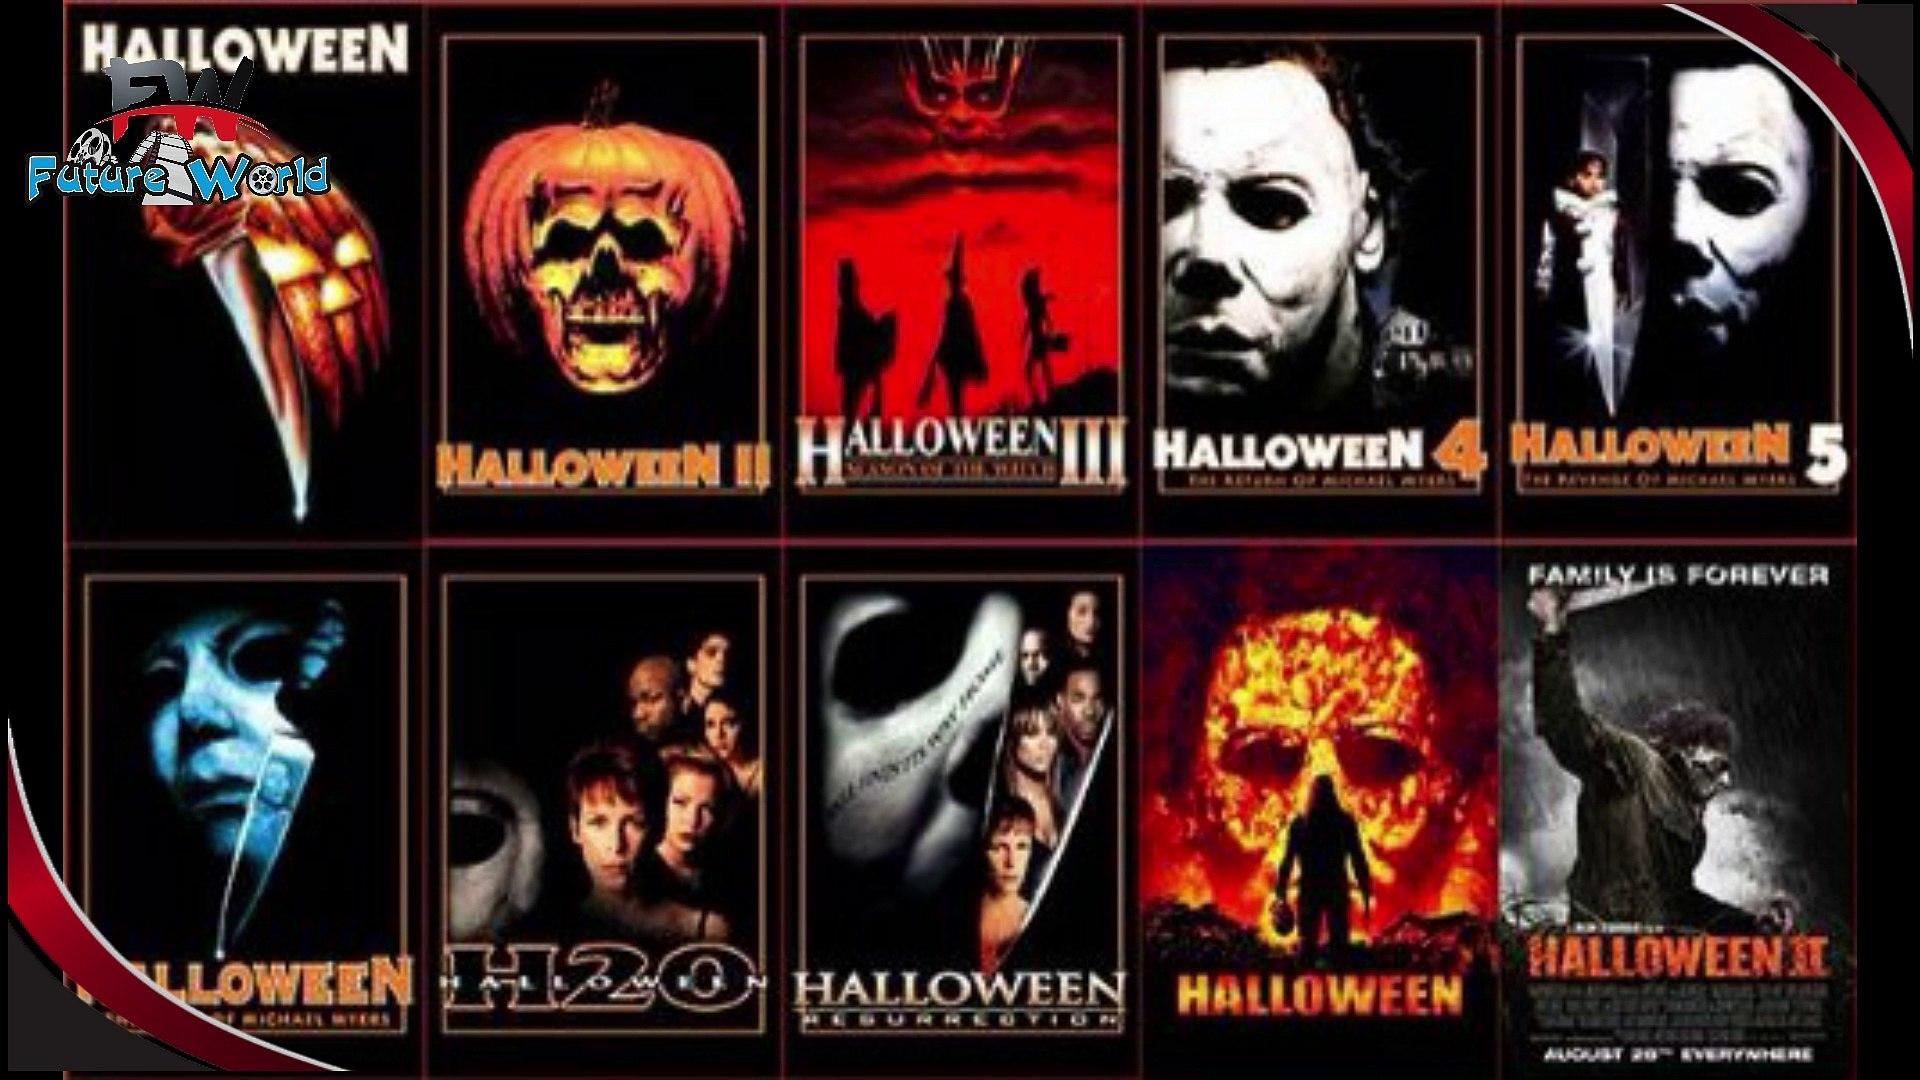 Halloween 5 Streaming Fr.Halloween Kills 2020 Movie Updates In Hindi L Halloweenkills Video Dailymotion